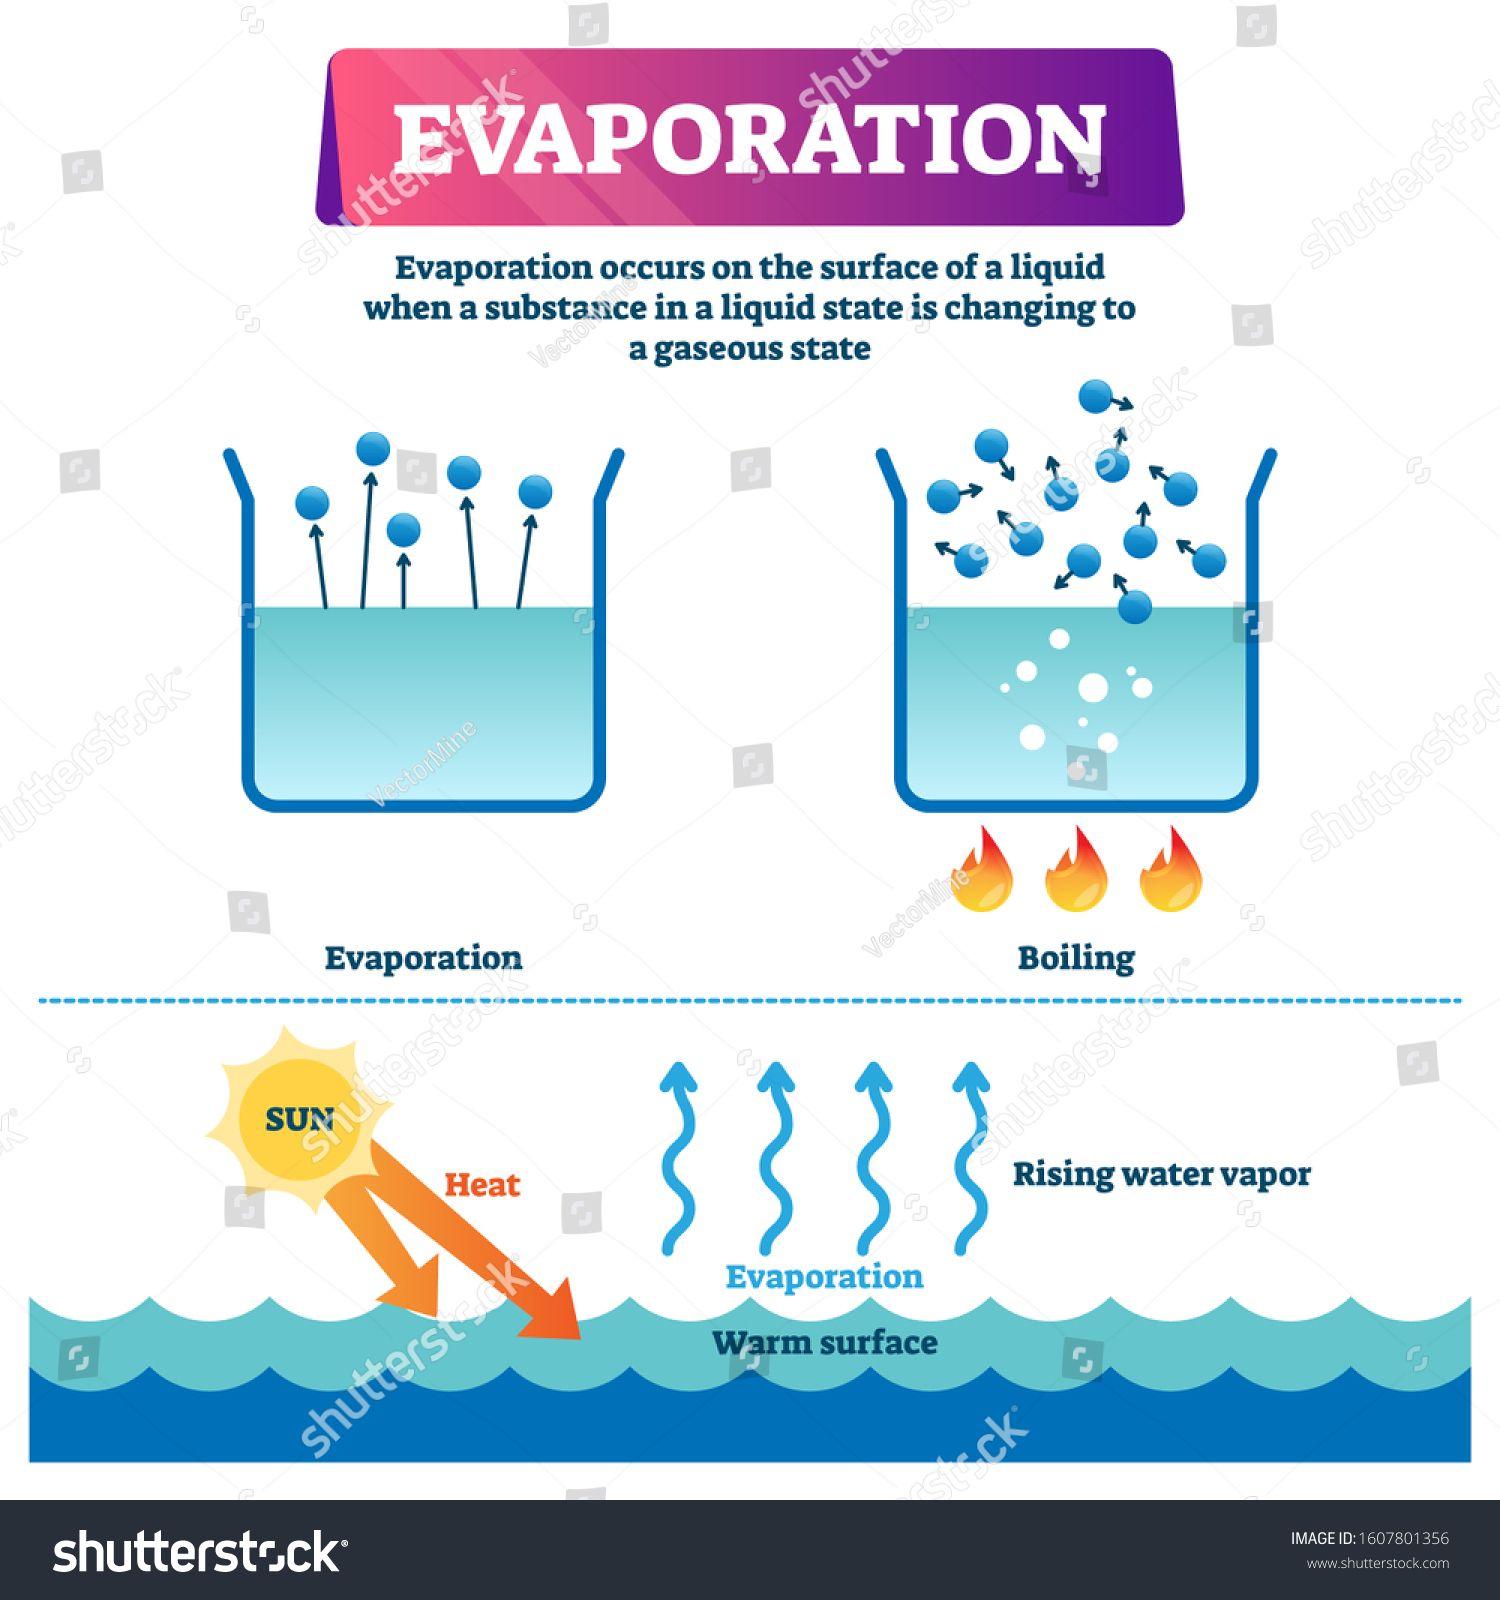 Evaporation Vector Illustration Labeled Liquid Surface Substance Change To Gas State Scheme Educational Explanation D Evaporation Surface Vector Illustration